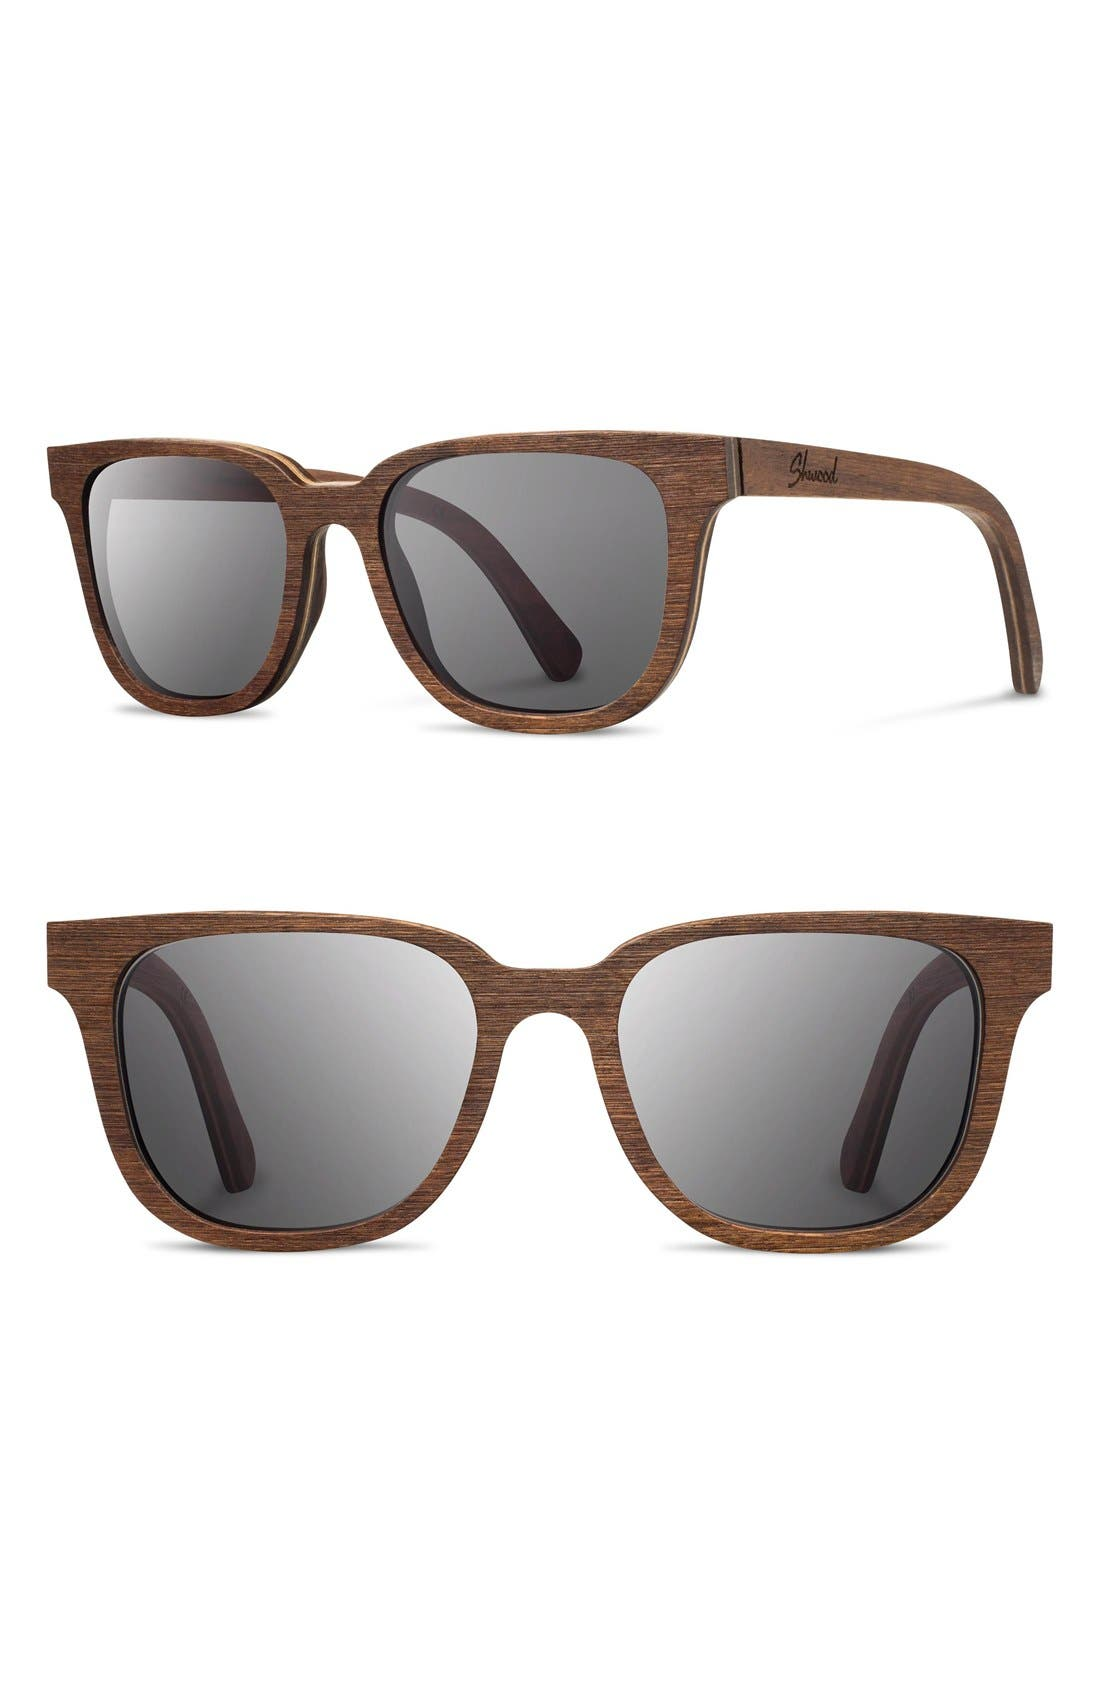 'Prescott' 52mm Wood Sunglasses,                             Main thumbnail 1, color,                             210